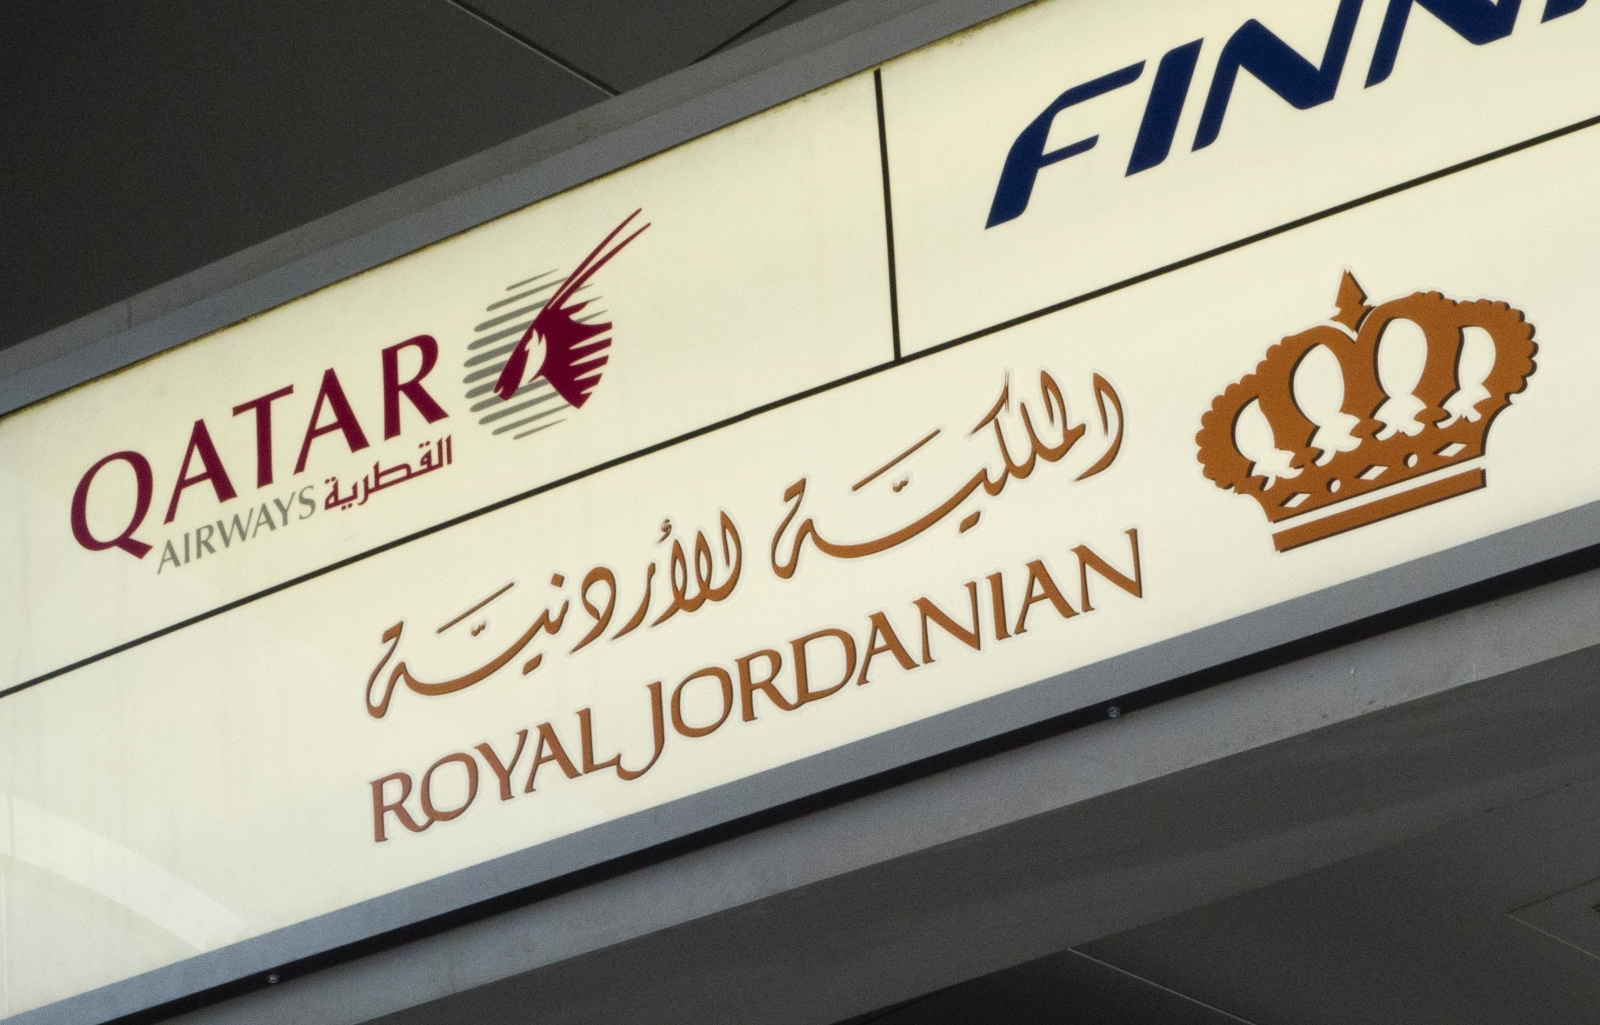 Royal Jordanian Qatar Airways